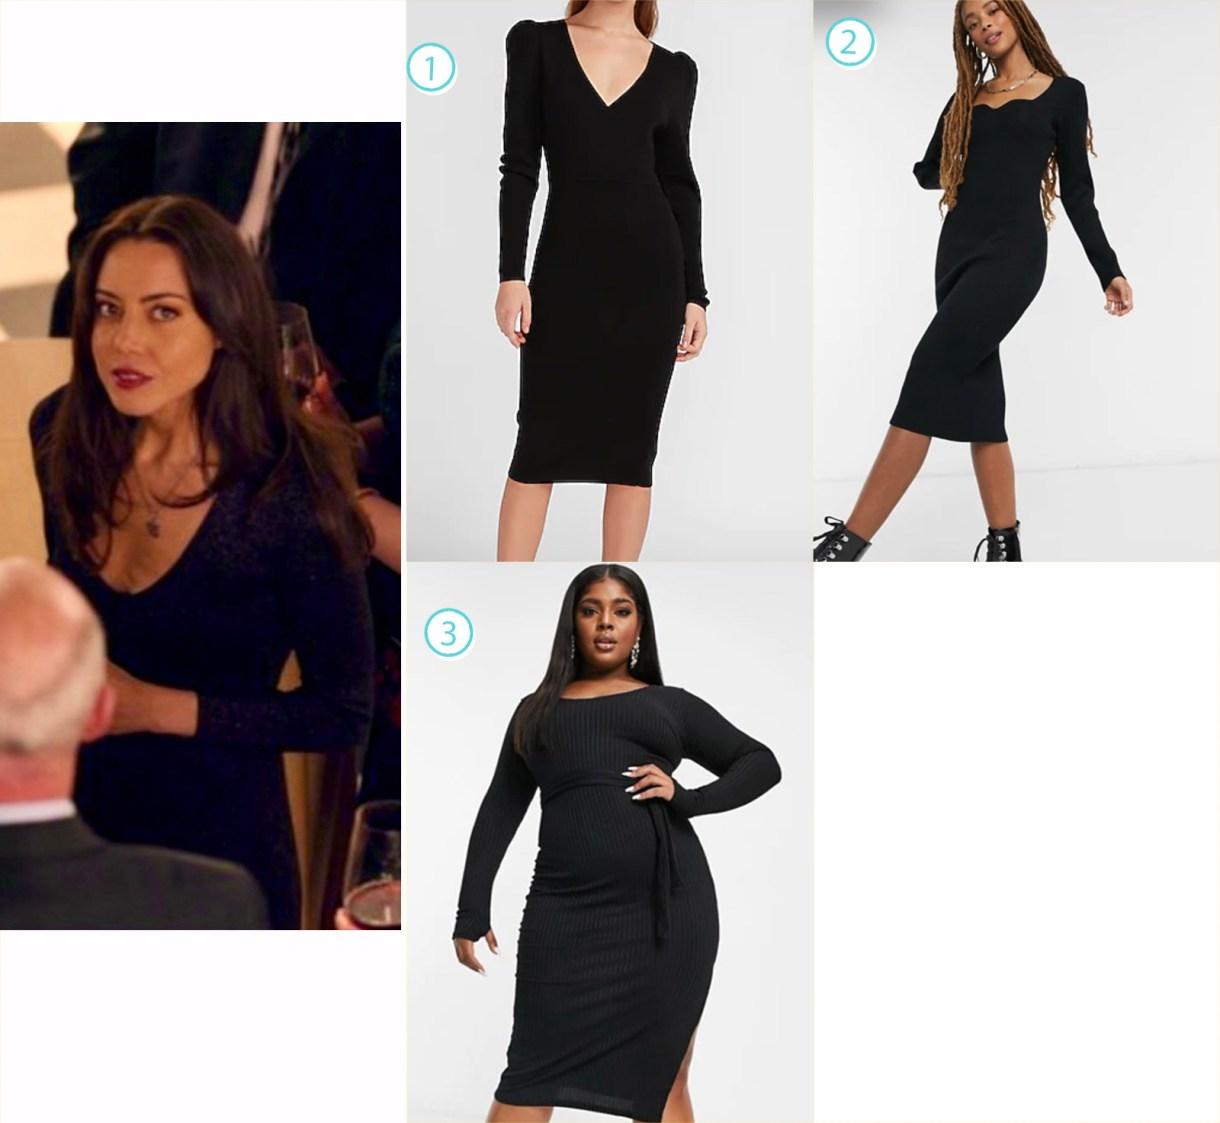 A variety of slinky black dresses like Aubrey Plaza